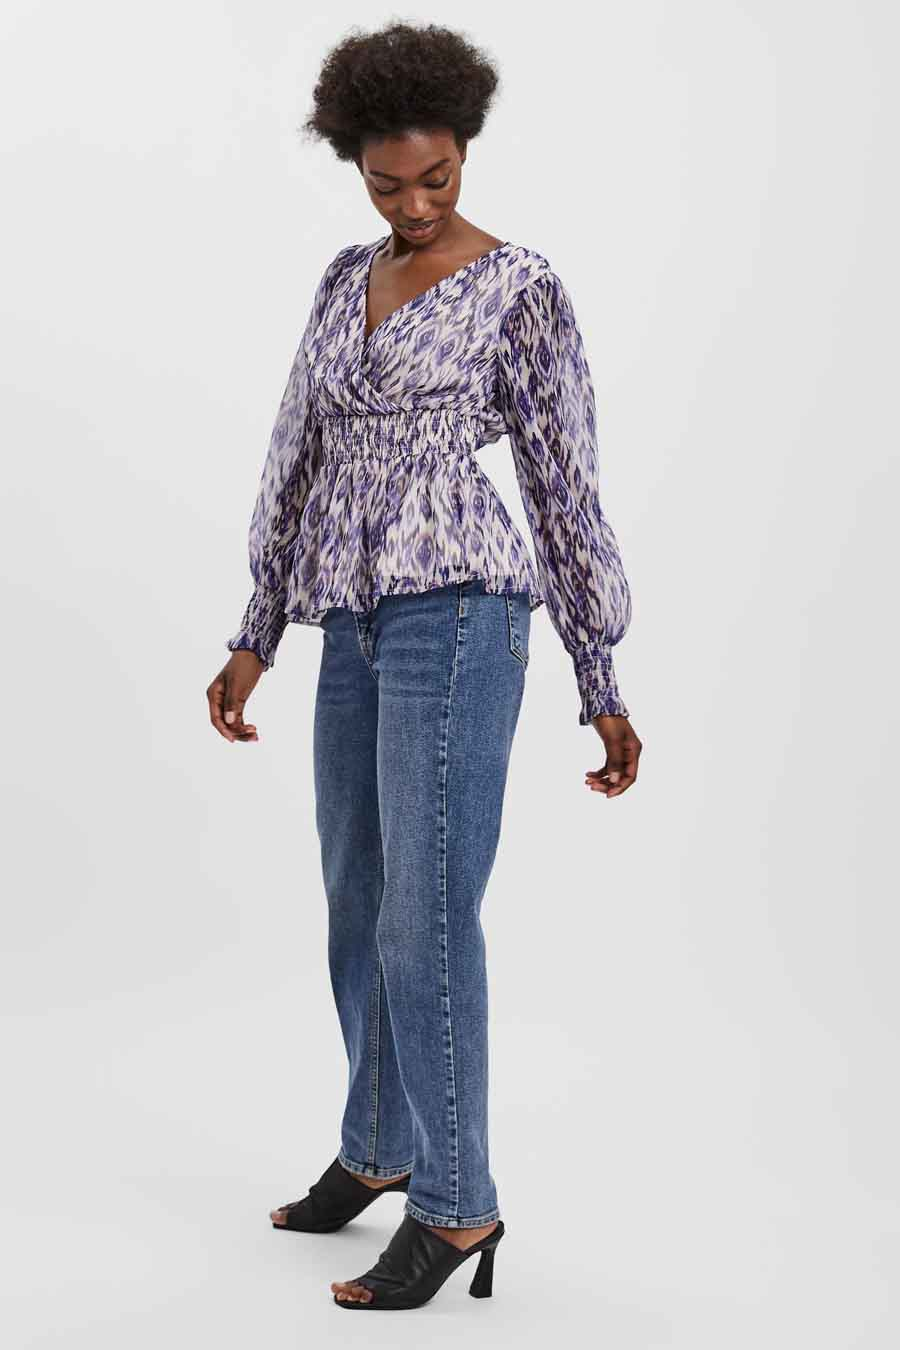 Vero Moda® Blouse lange mouwen, Beige, Dames, Maat: L/M/S/XL/XS